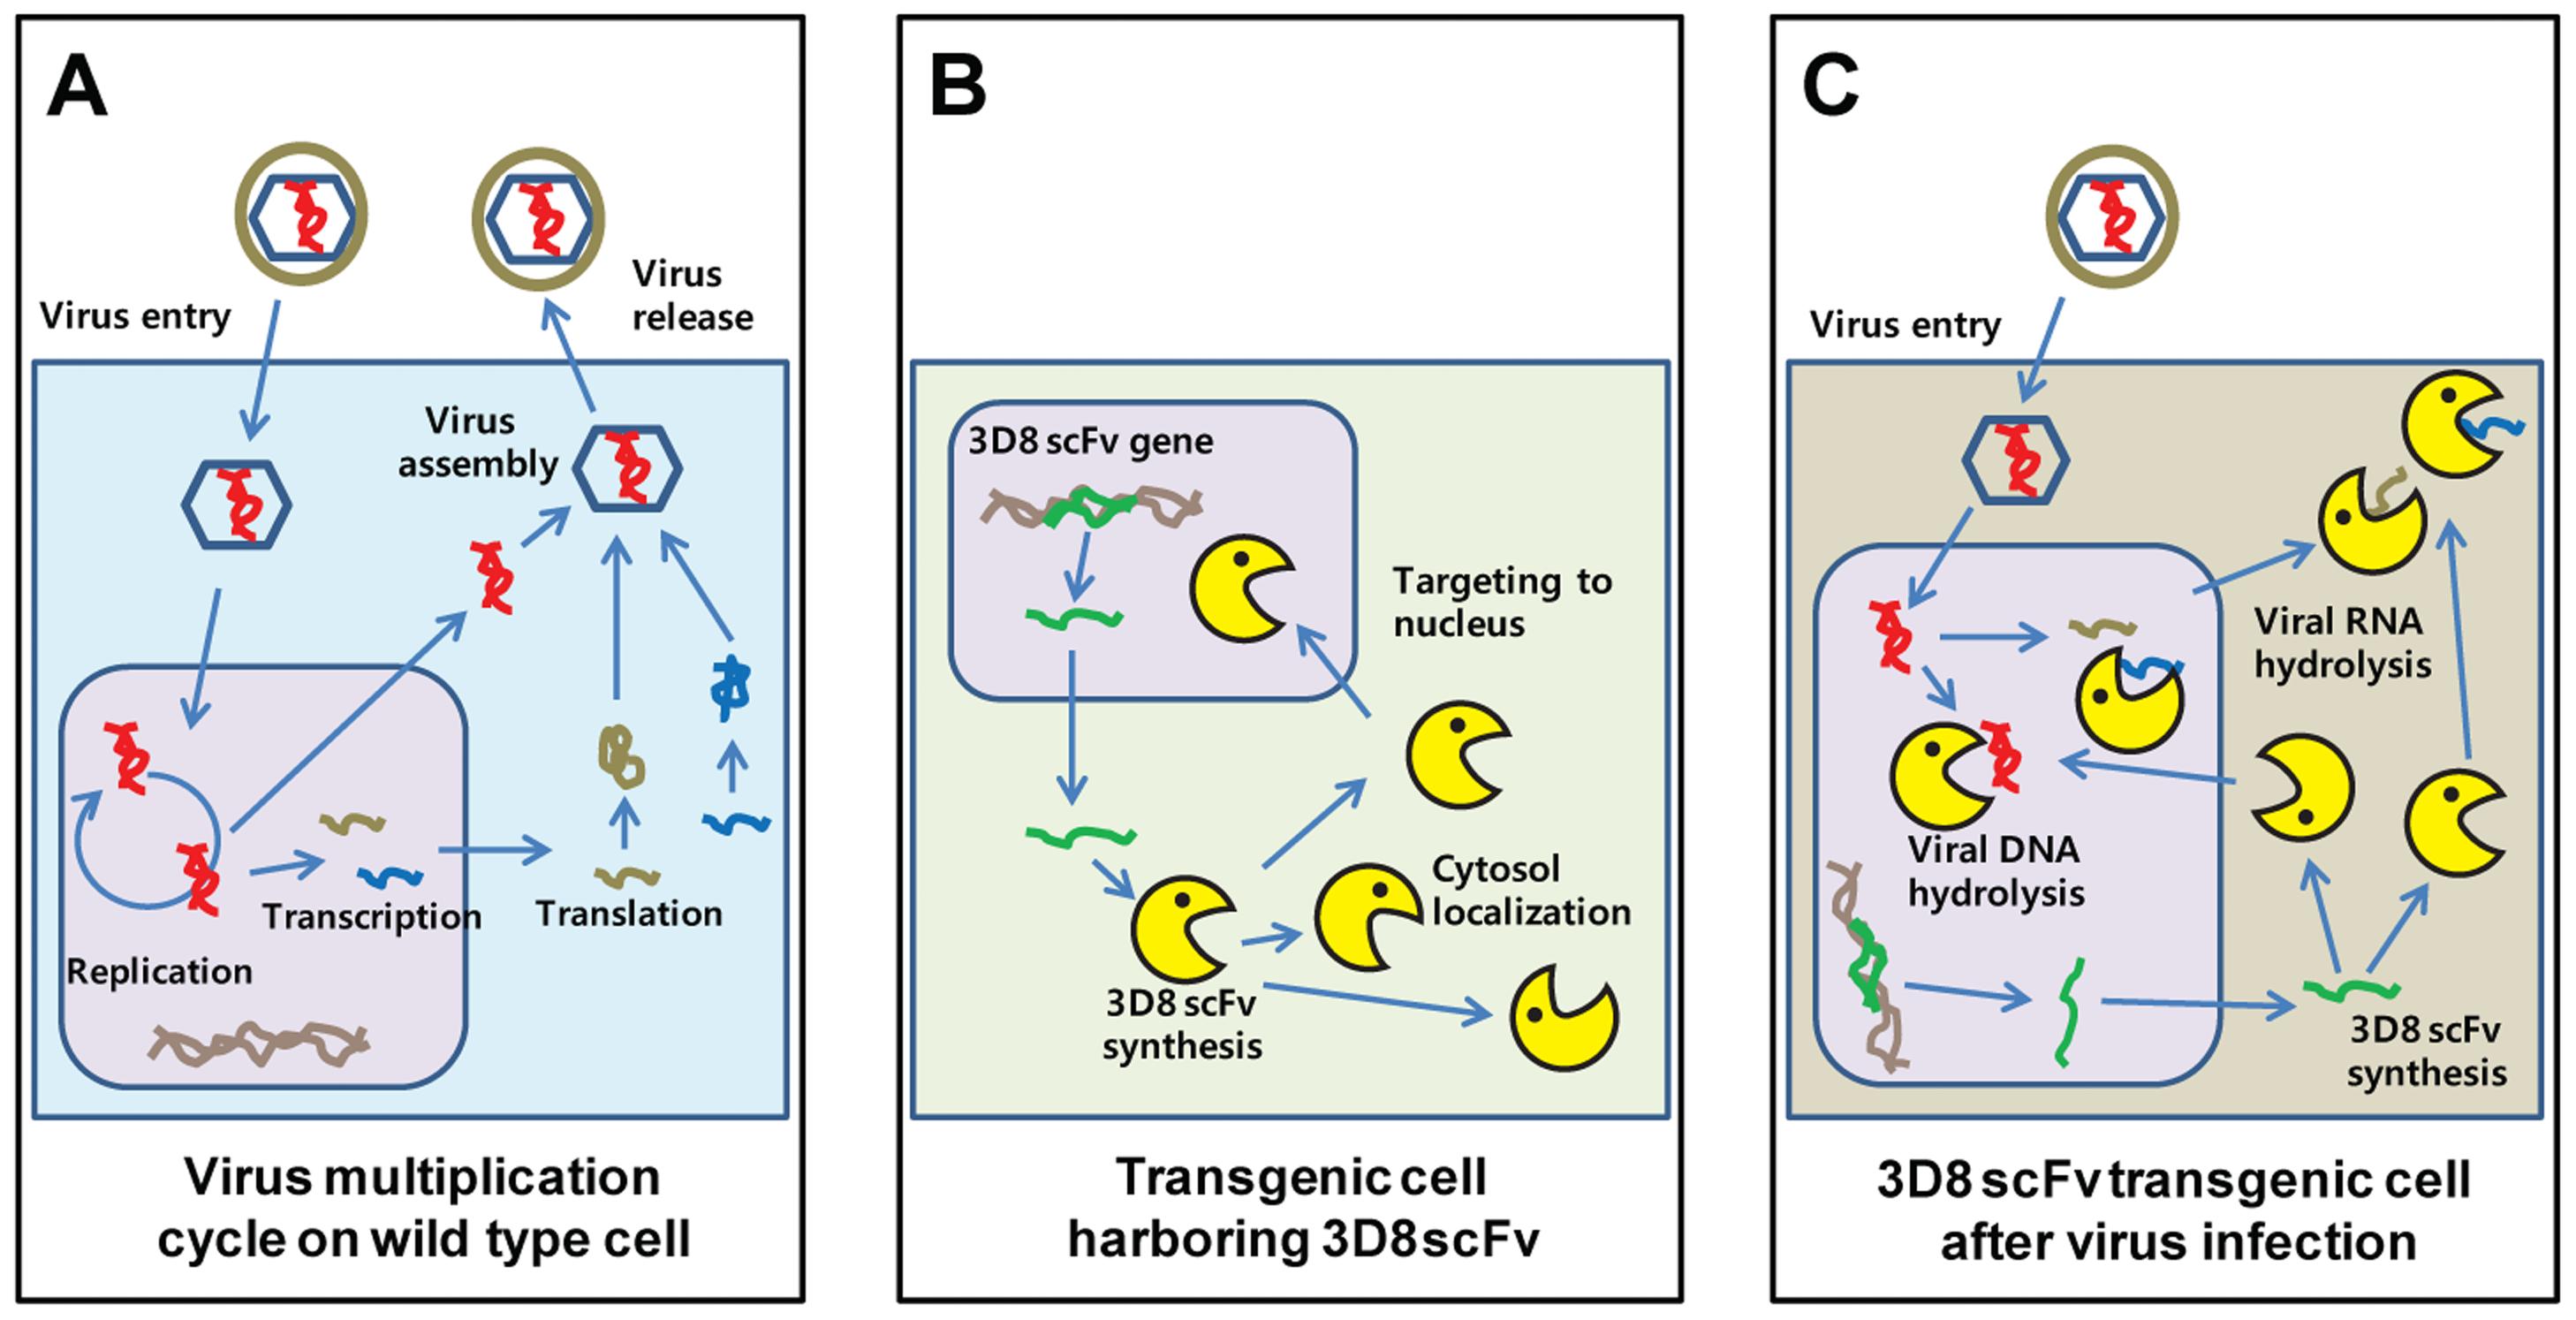 New antiviral mechanism by 3D8 scFv protein.